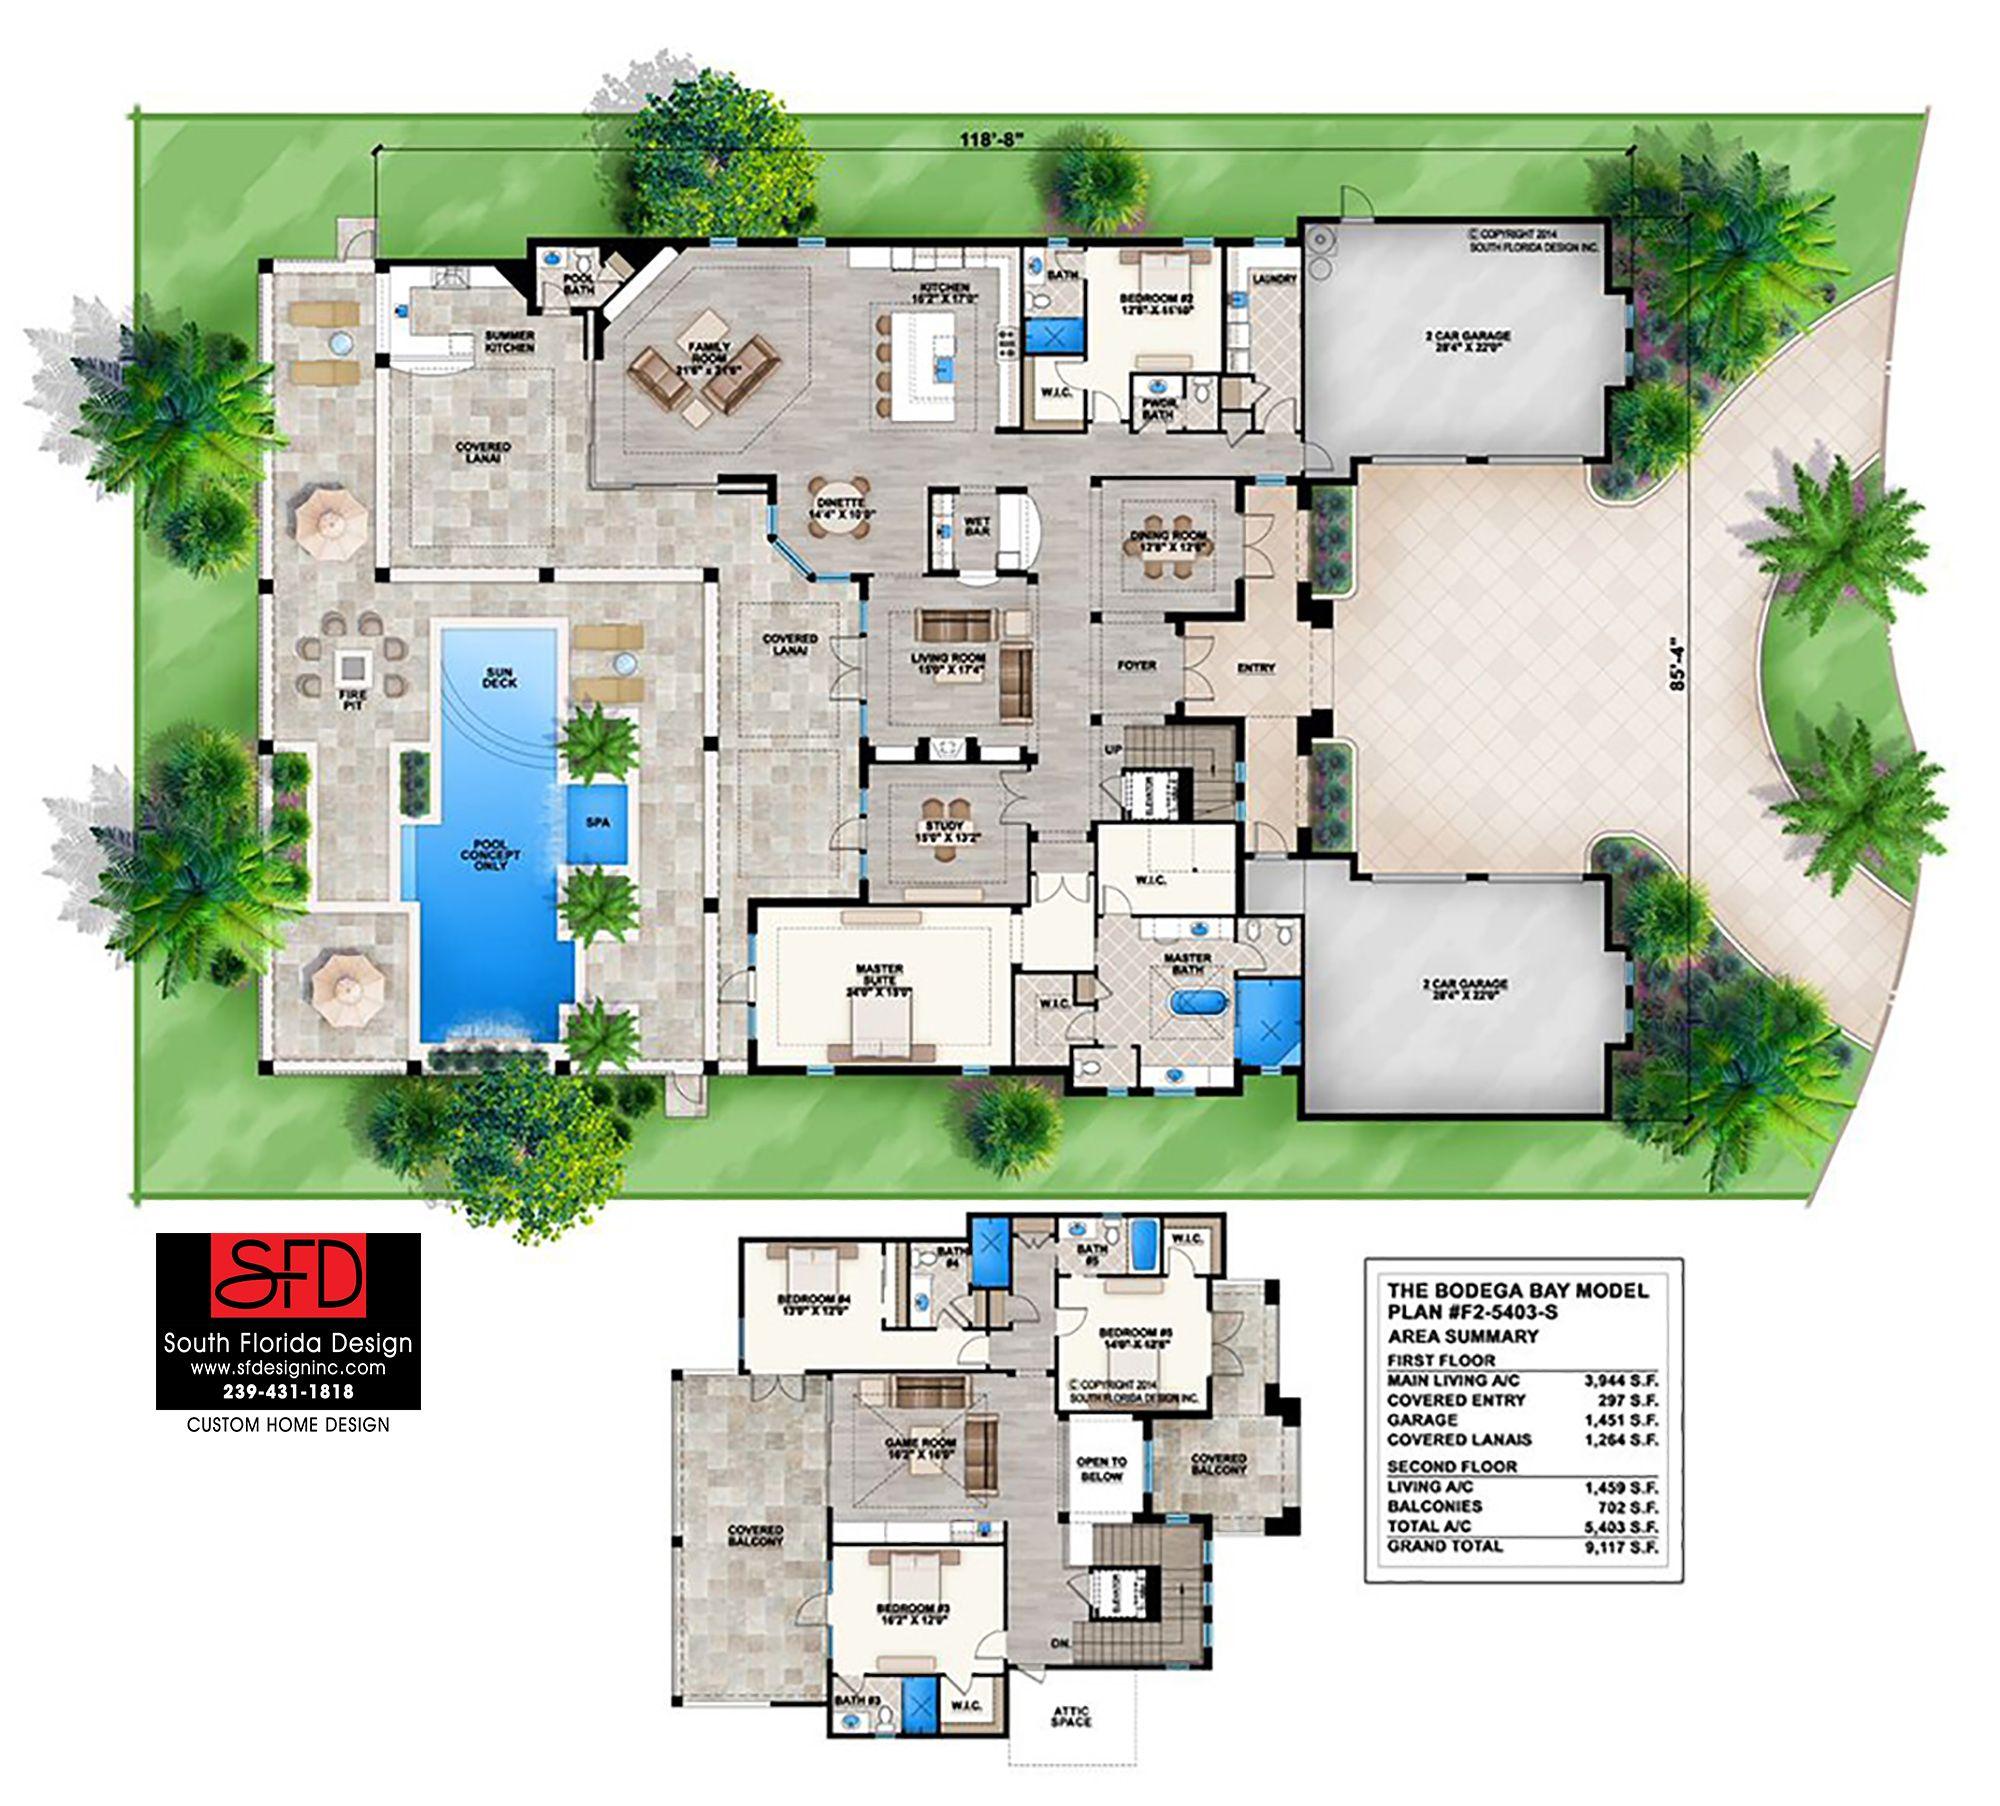 2 Story Coastal Contemporary House Plan 239 431 1818 Florida House Plans Coastal House Plans Beach House Floor Plans